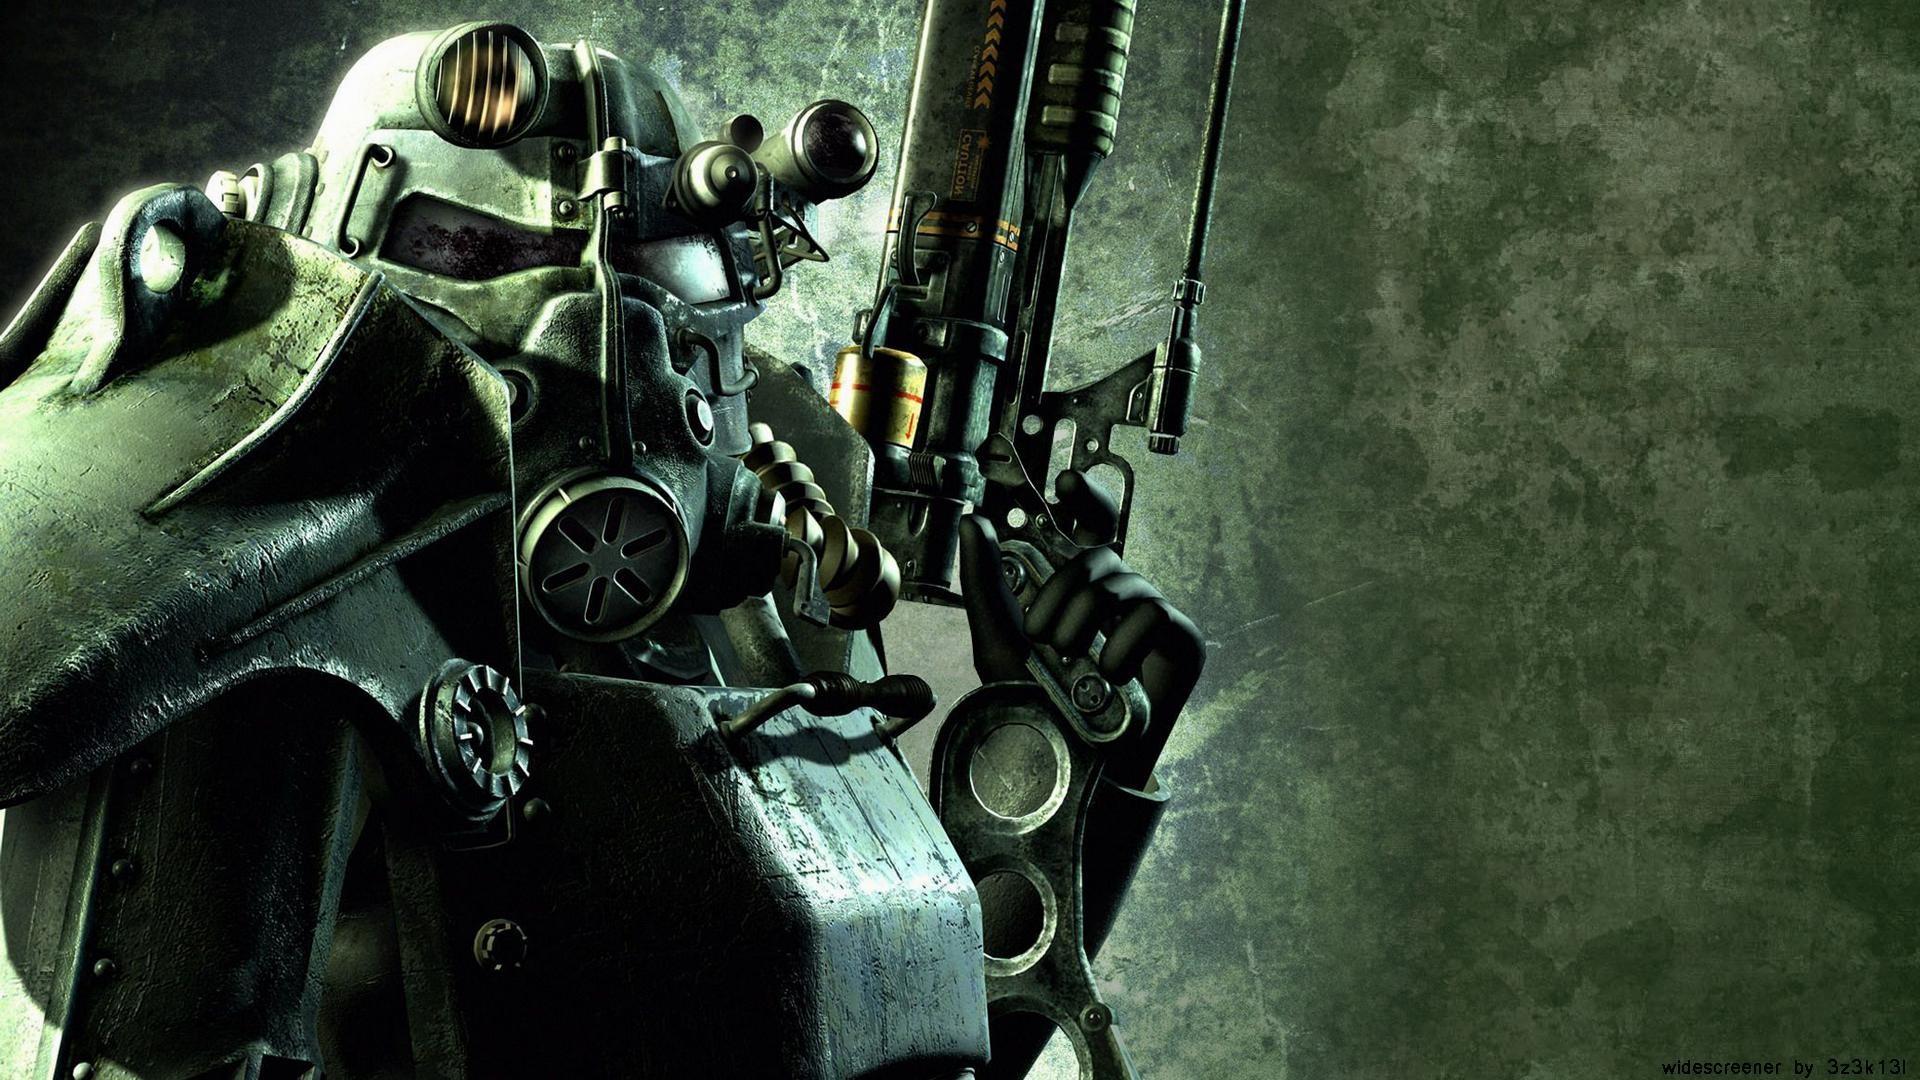 1920x1200 Fallout 3 Wallpaper HD For Desktop